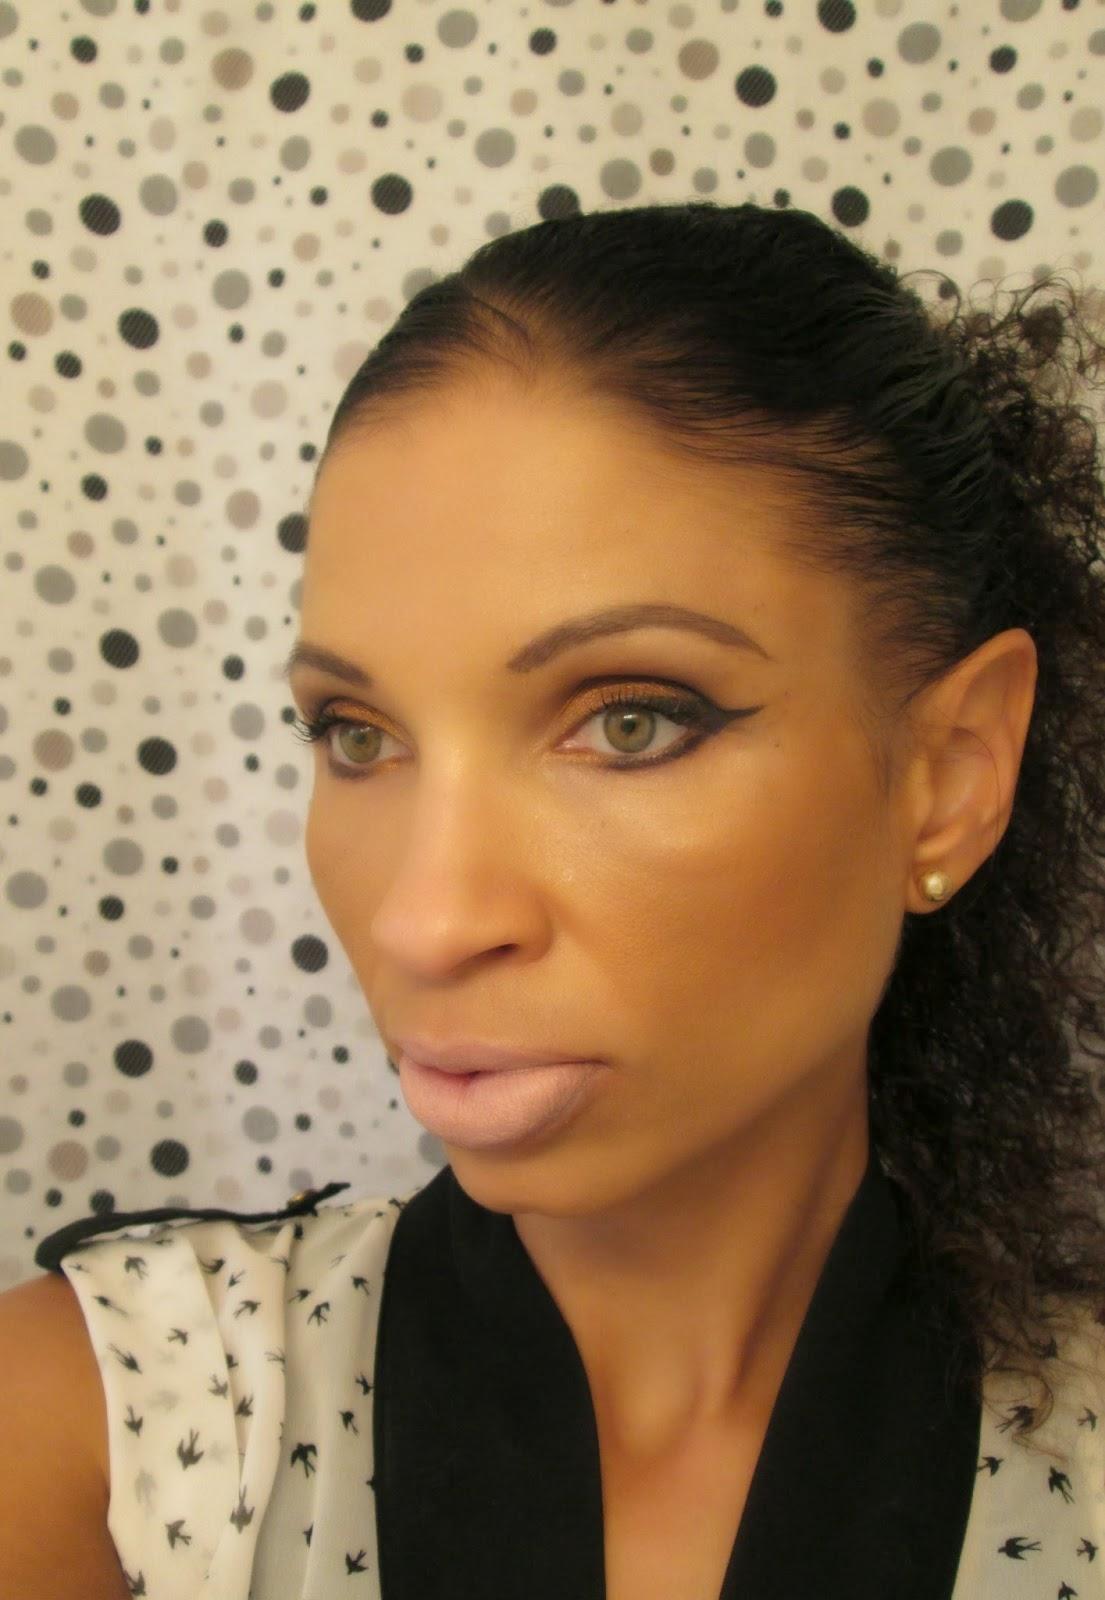 http://chrysalisglam101.blogspot.com/2014/08/requested-youtube-makeup-tutorial-fotd.html